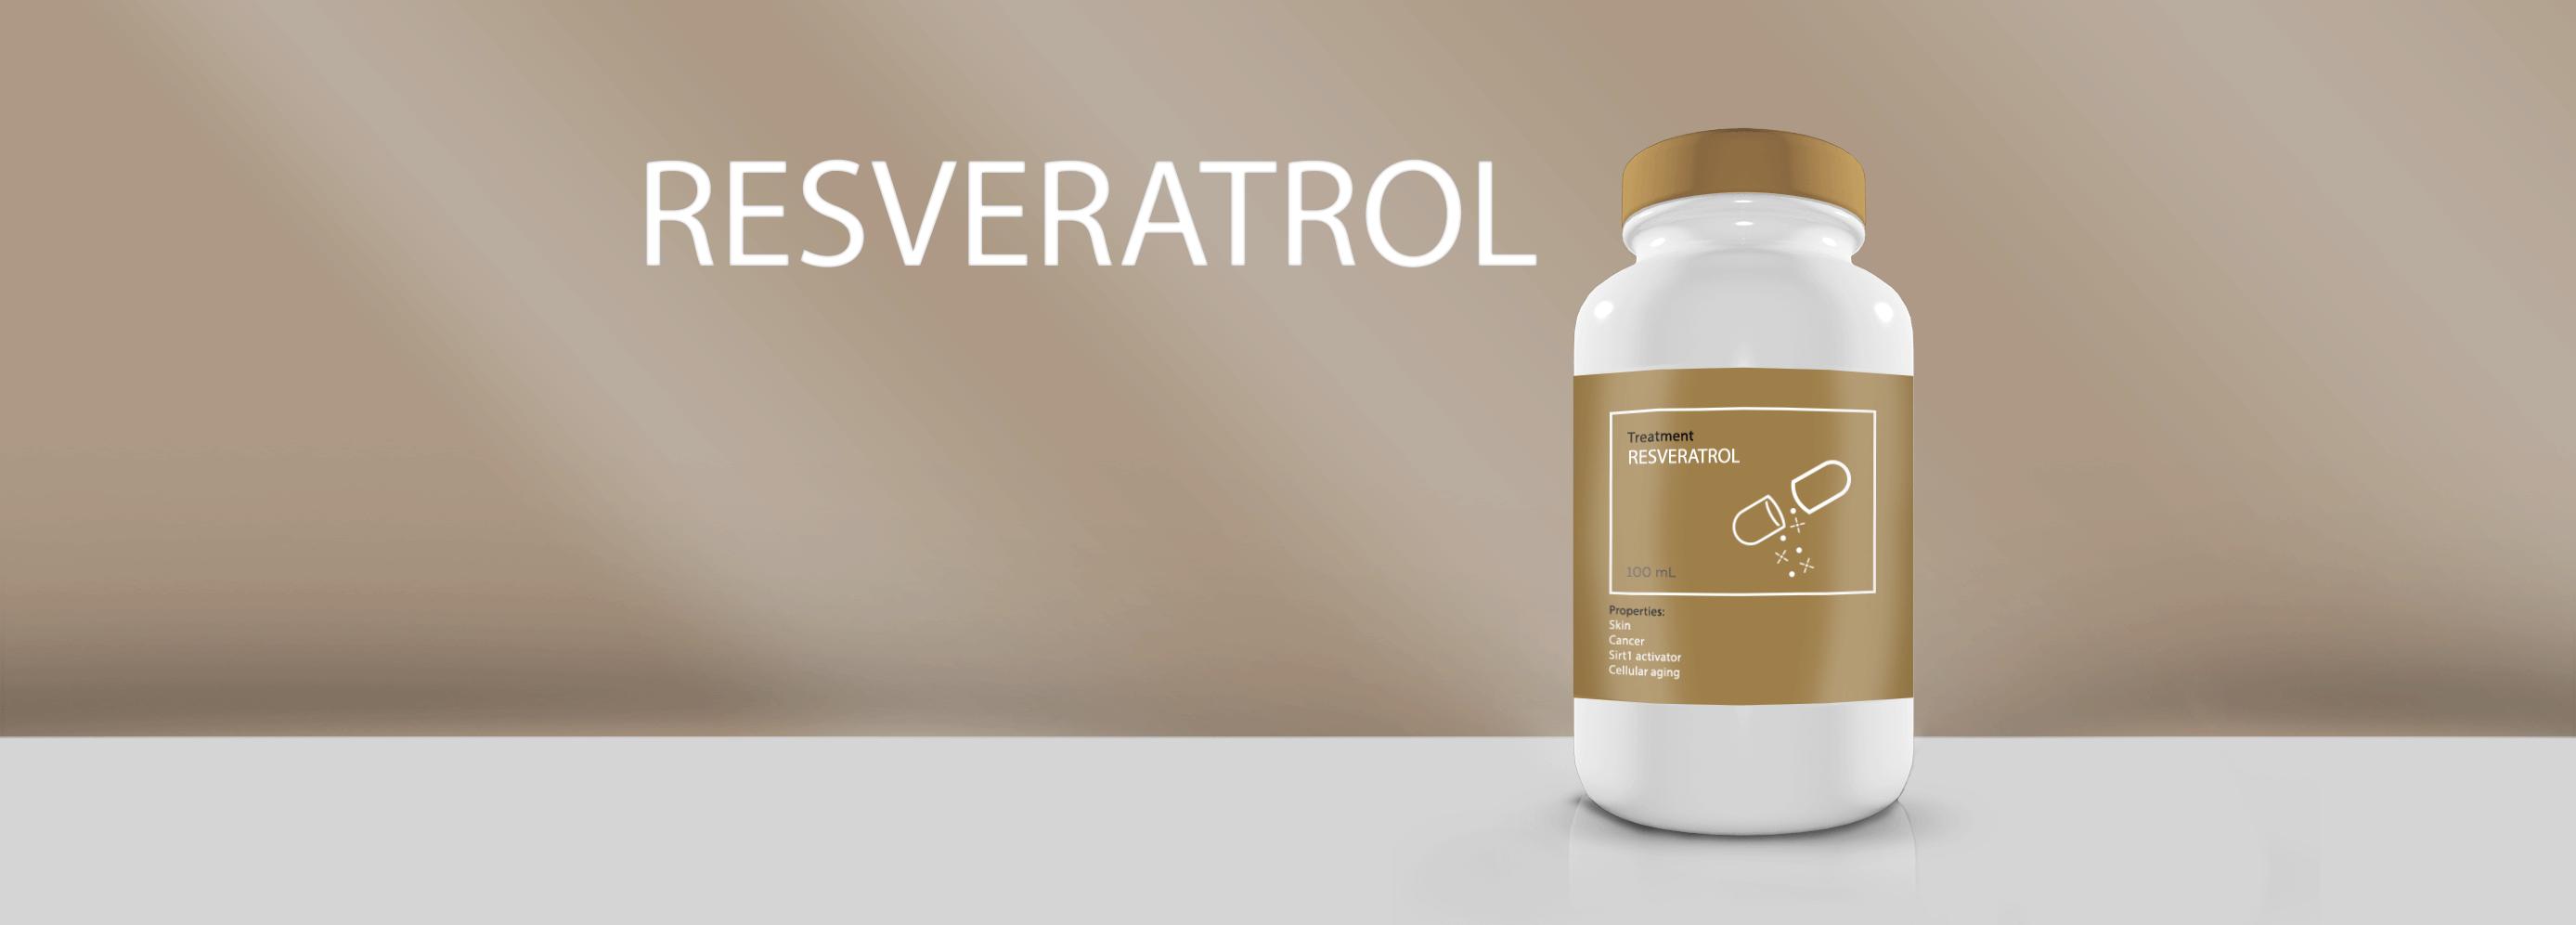 Resveratrol Antioxidant Pro Sirtuins Anti Aging Work For Human Longevity